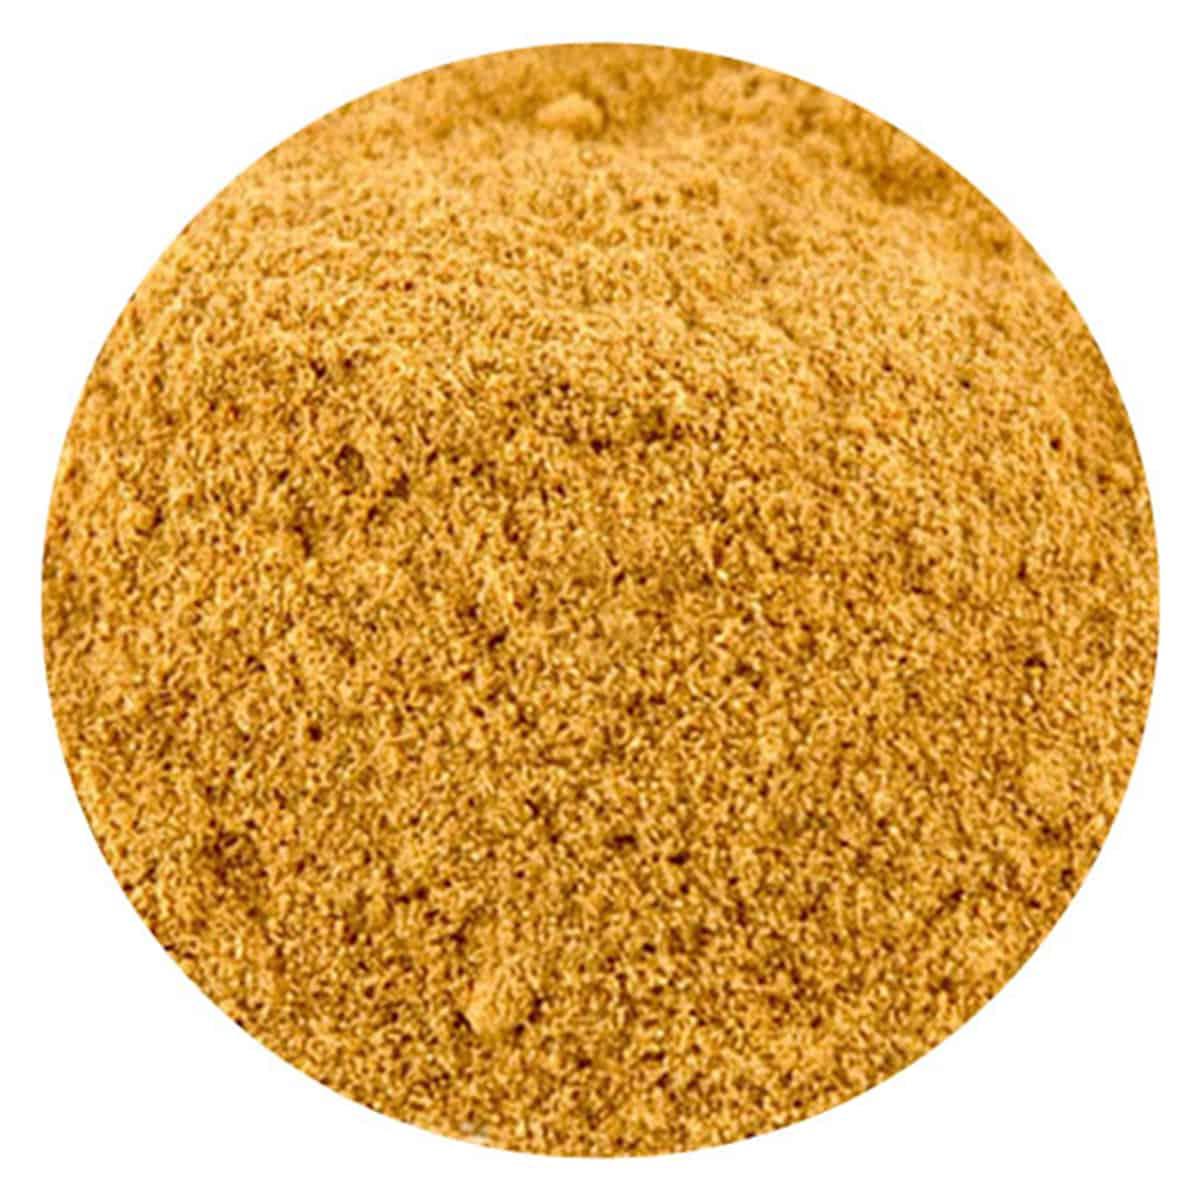 Buy IAG Foods Cinnamon Powder (Soft / Ceylon / True Cinnamon) - 1 kg